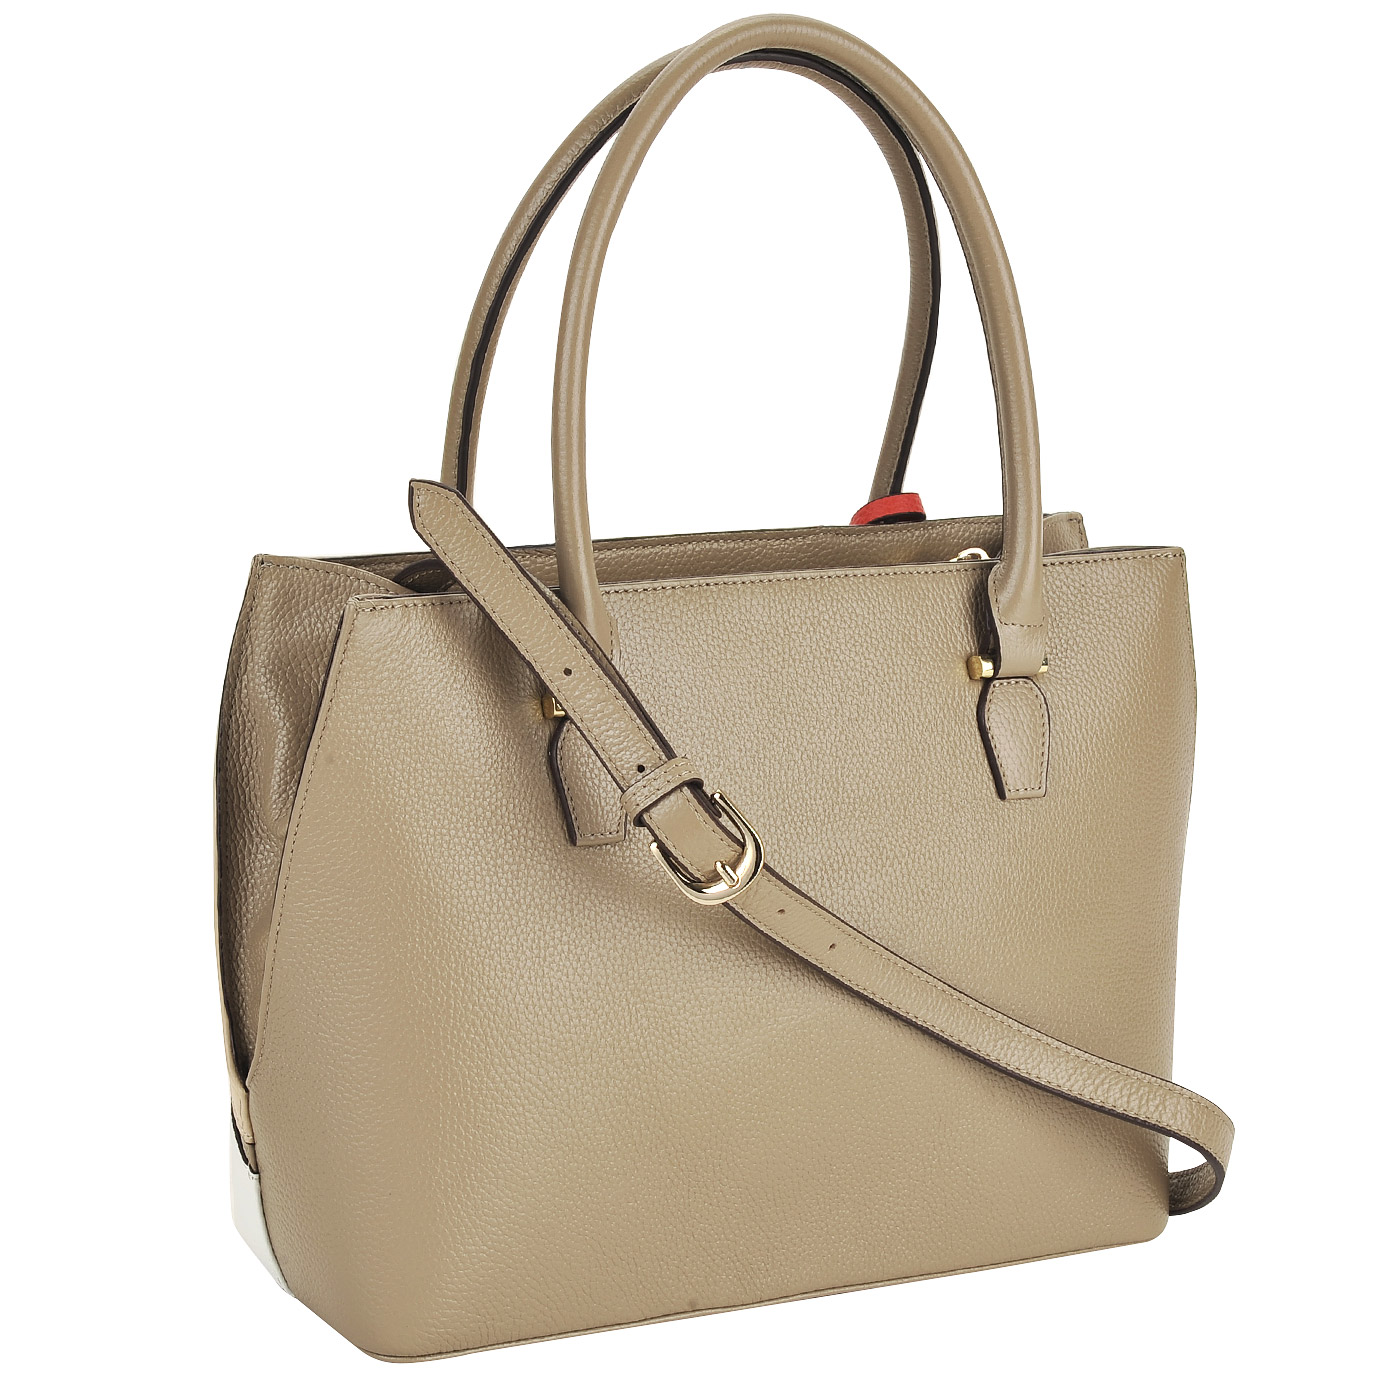 d5727deb92c8 Кожаная сумка с принтом Fiato Dream 3062 FD - 2000557739611 ...